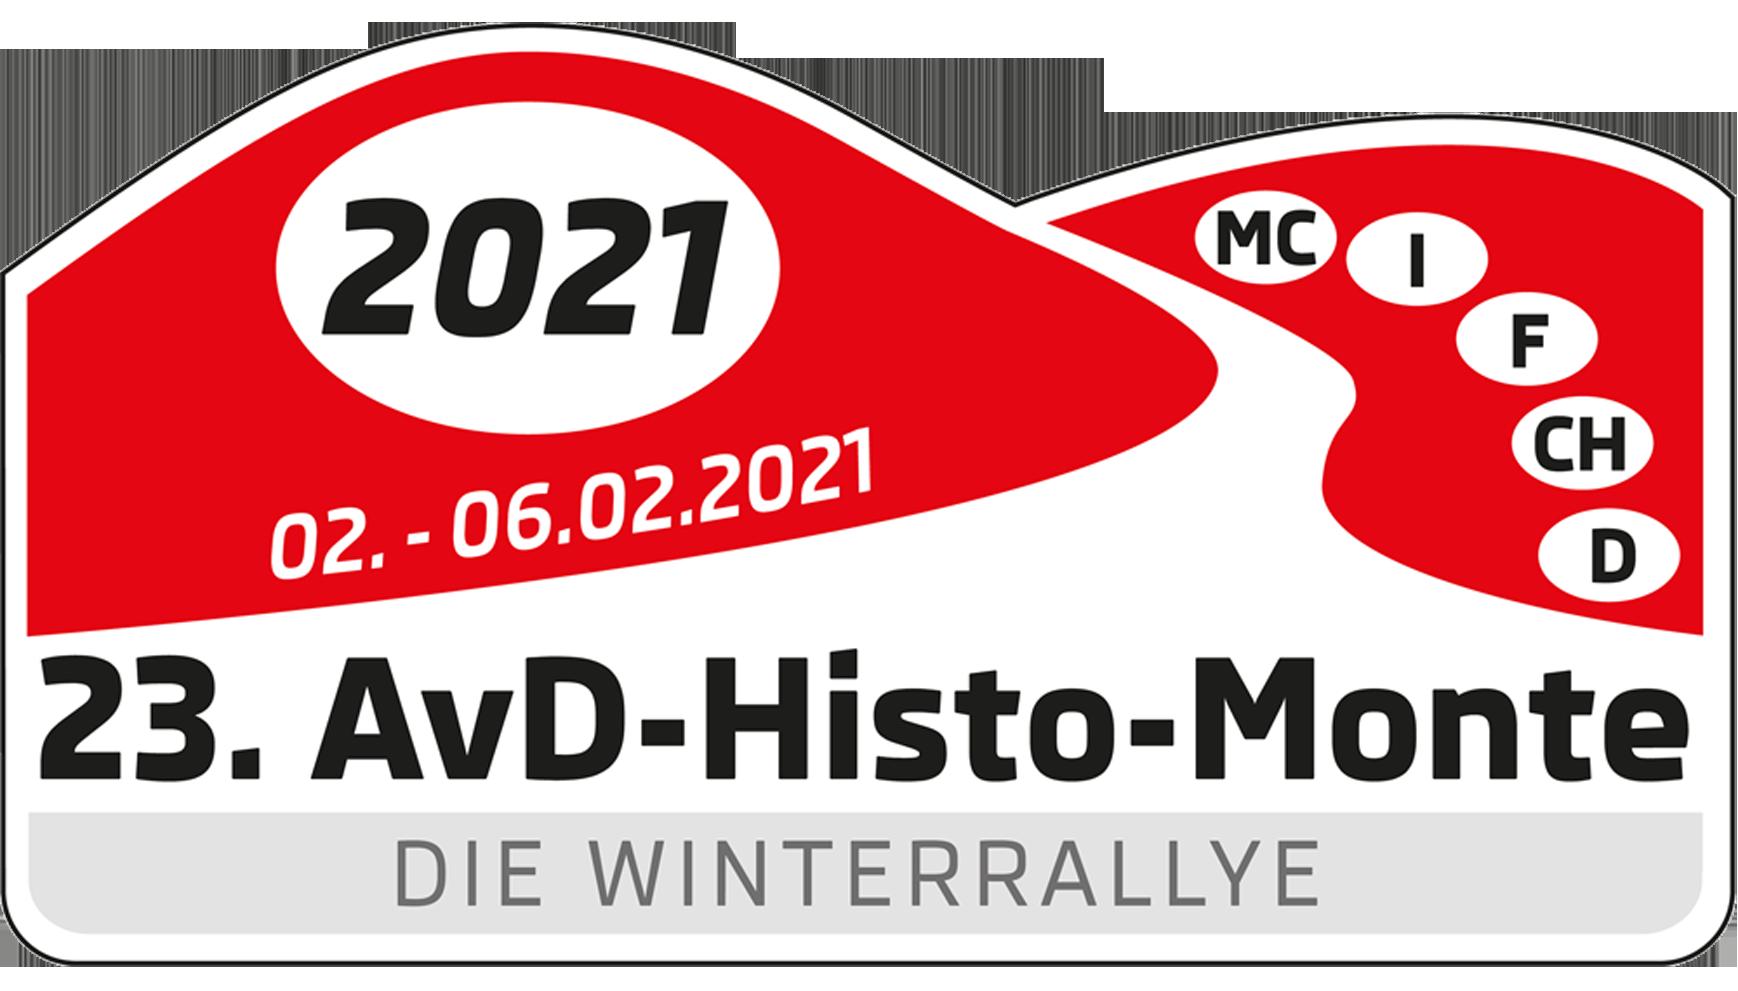 AvD Histo Monte